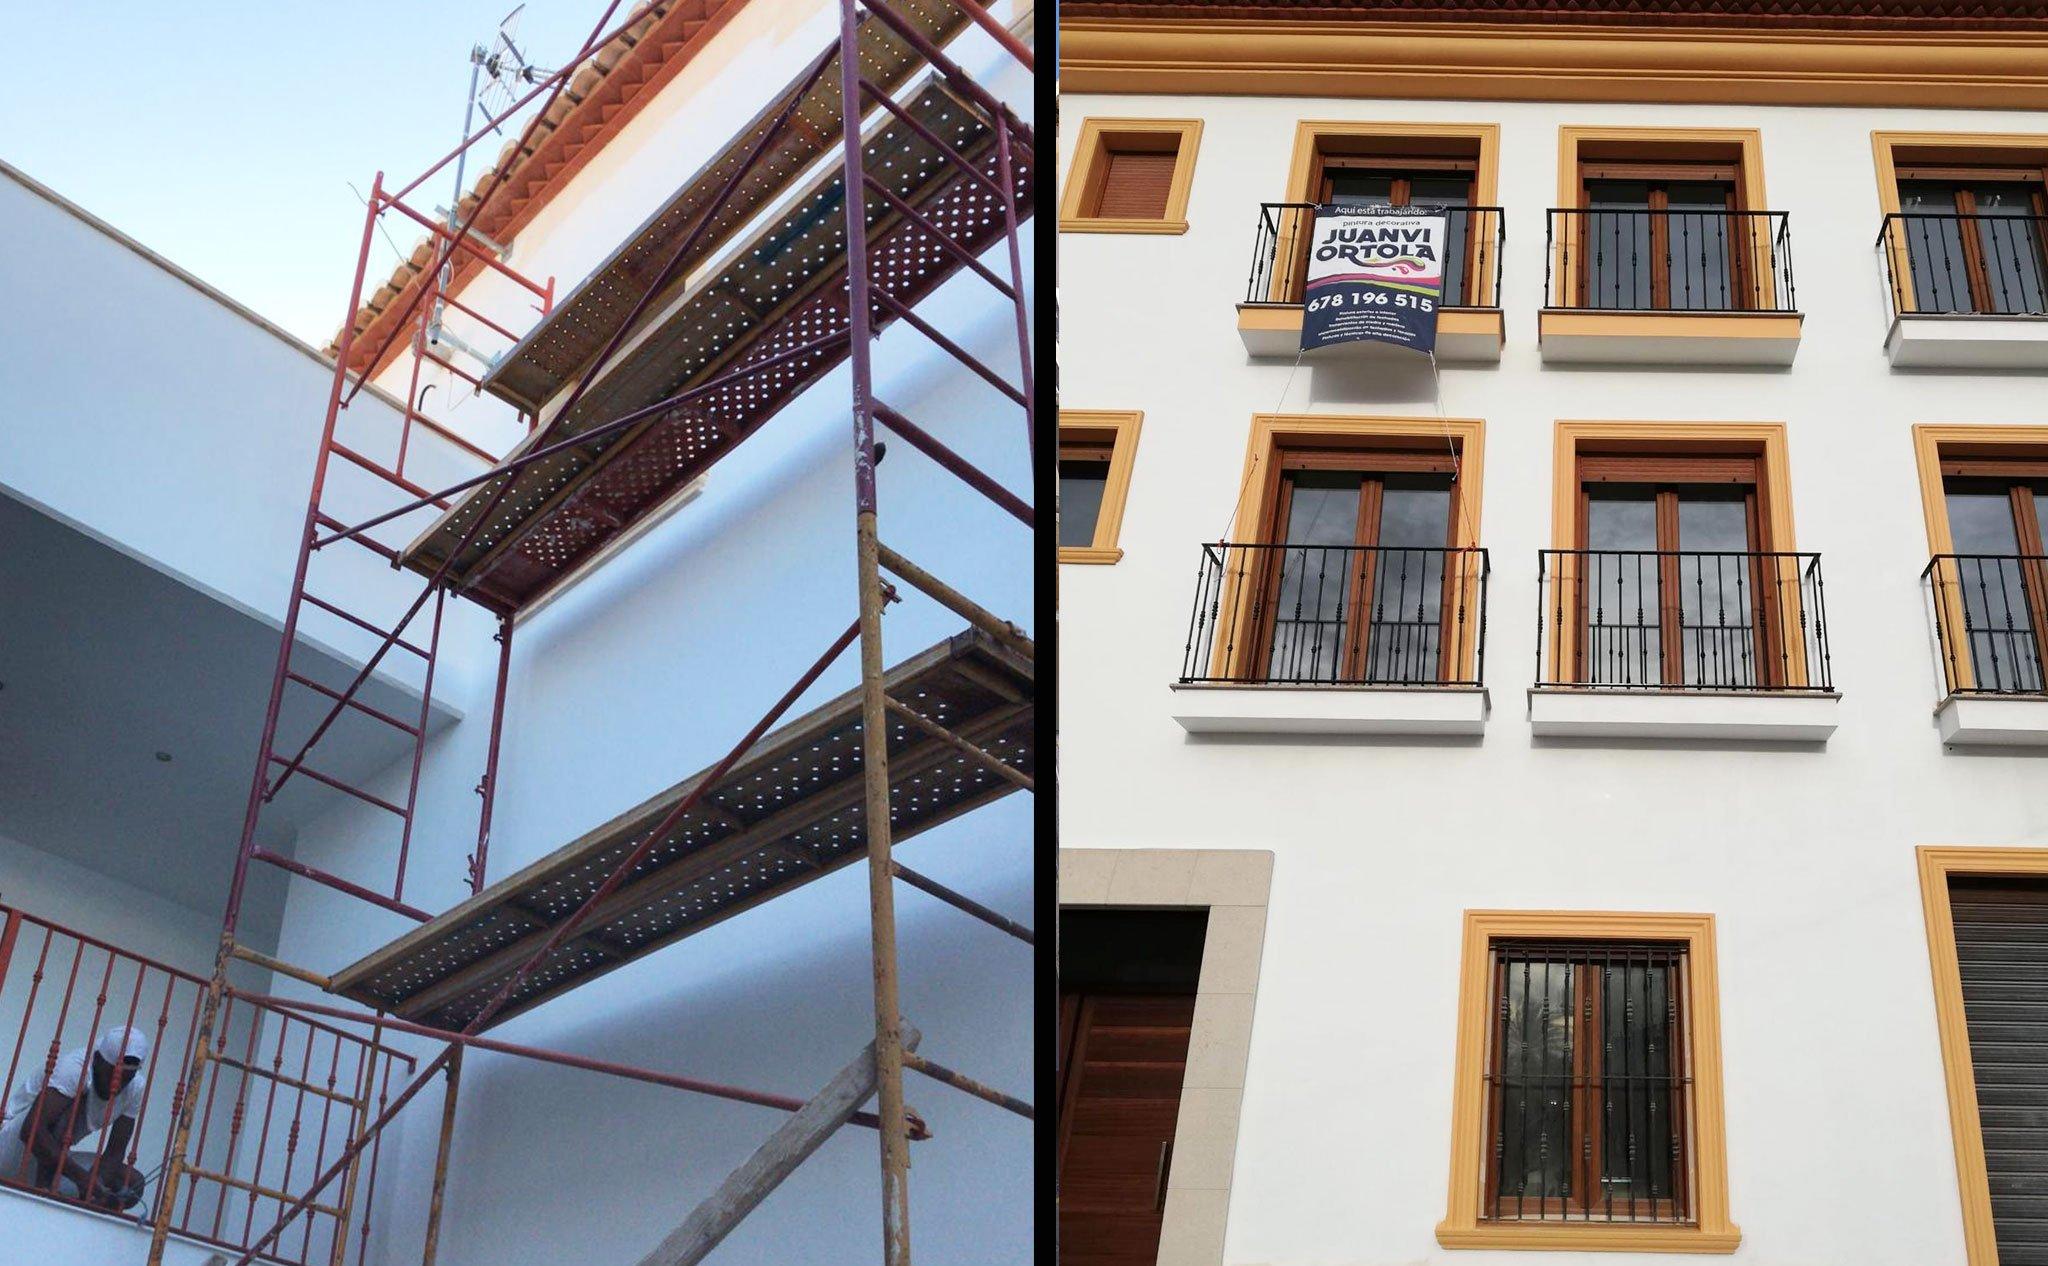 Antes y después de la pintura de una finca – Pinturas Juanvi Ortolà